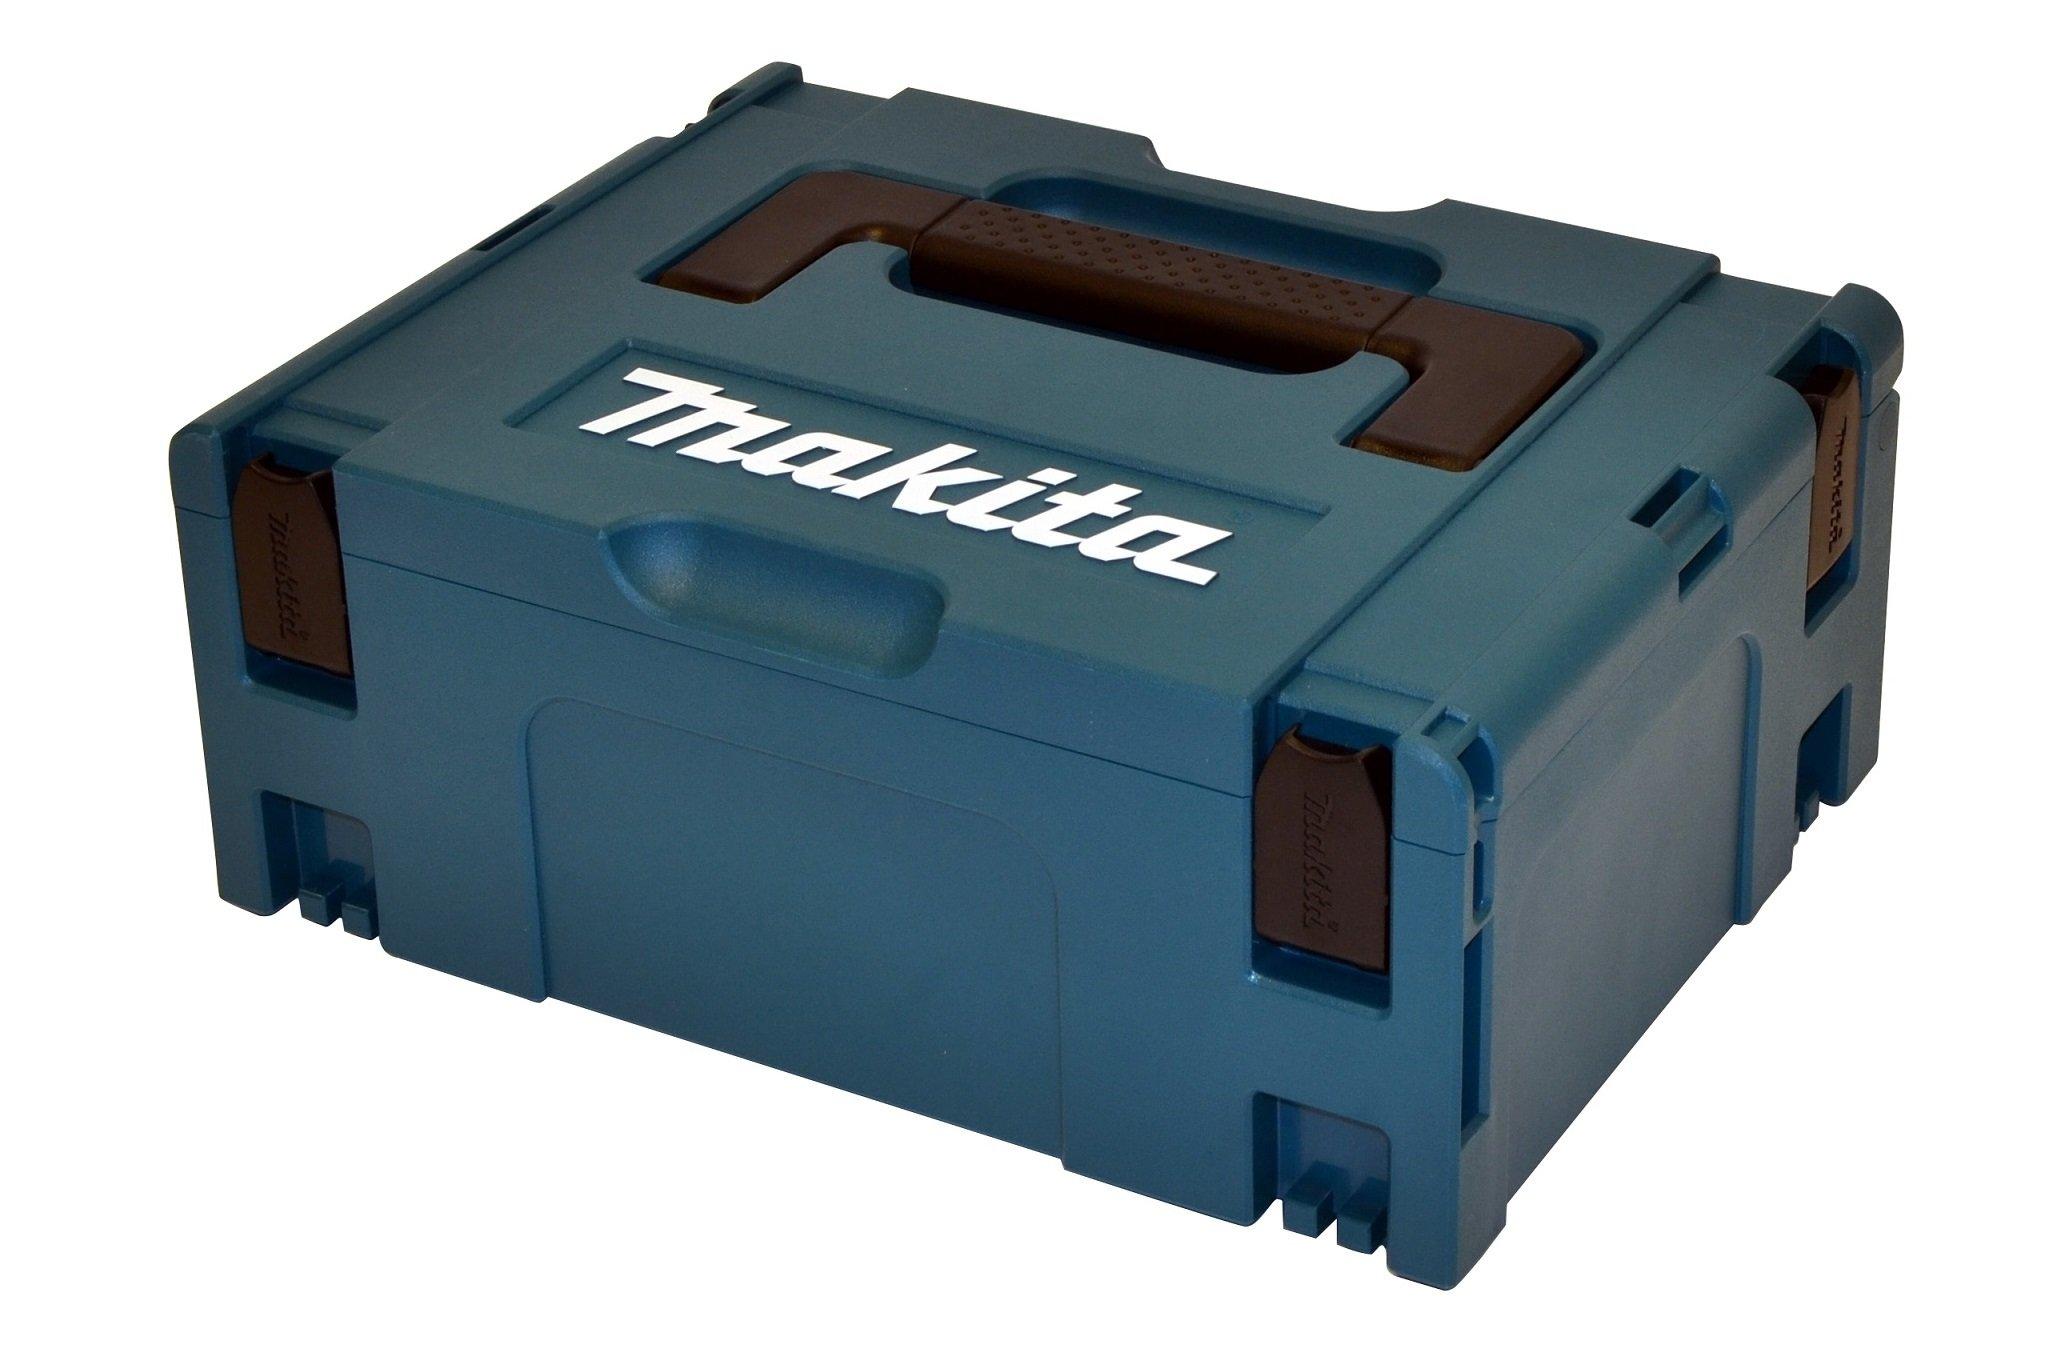 Makita-Akku-Bohrschrauber-18-V50-Ah-im-Makpac-inklusive-2-Akkus-und-Ladegert-DDF459RTJ